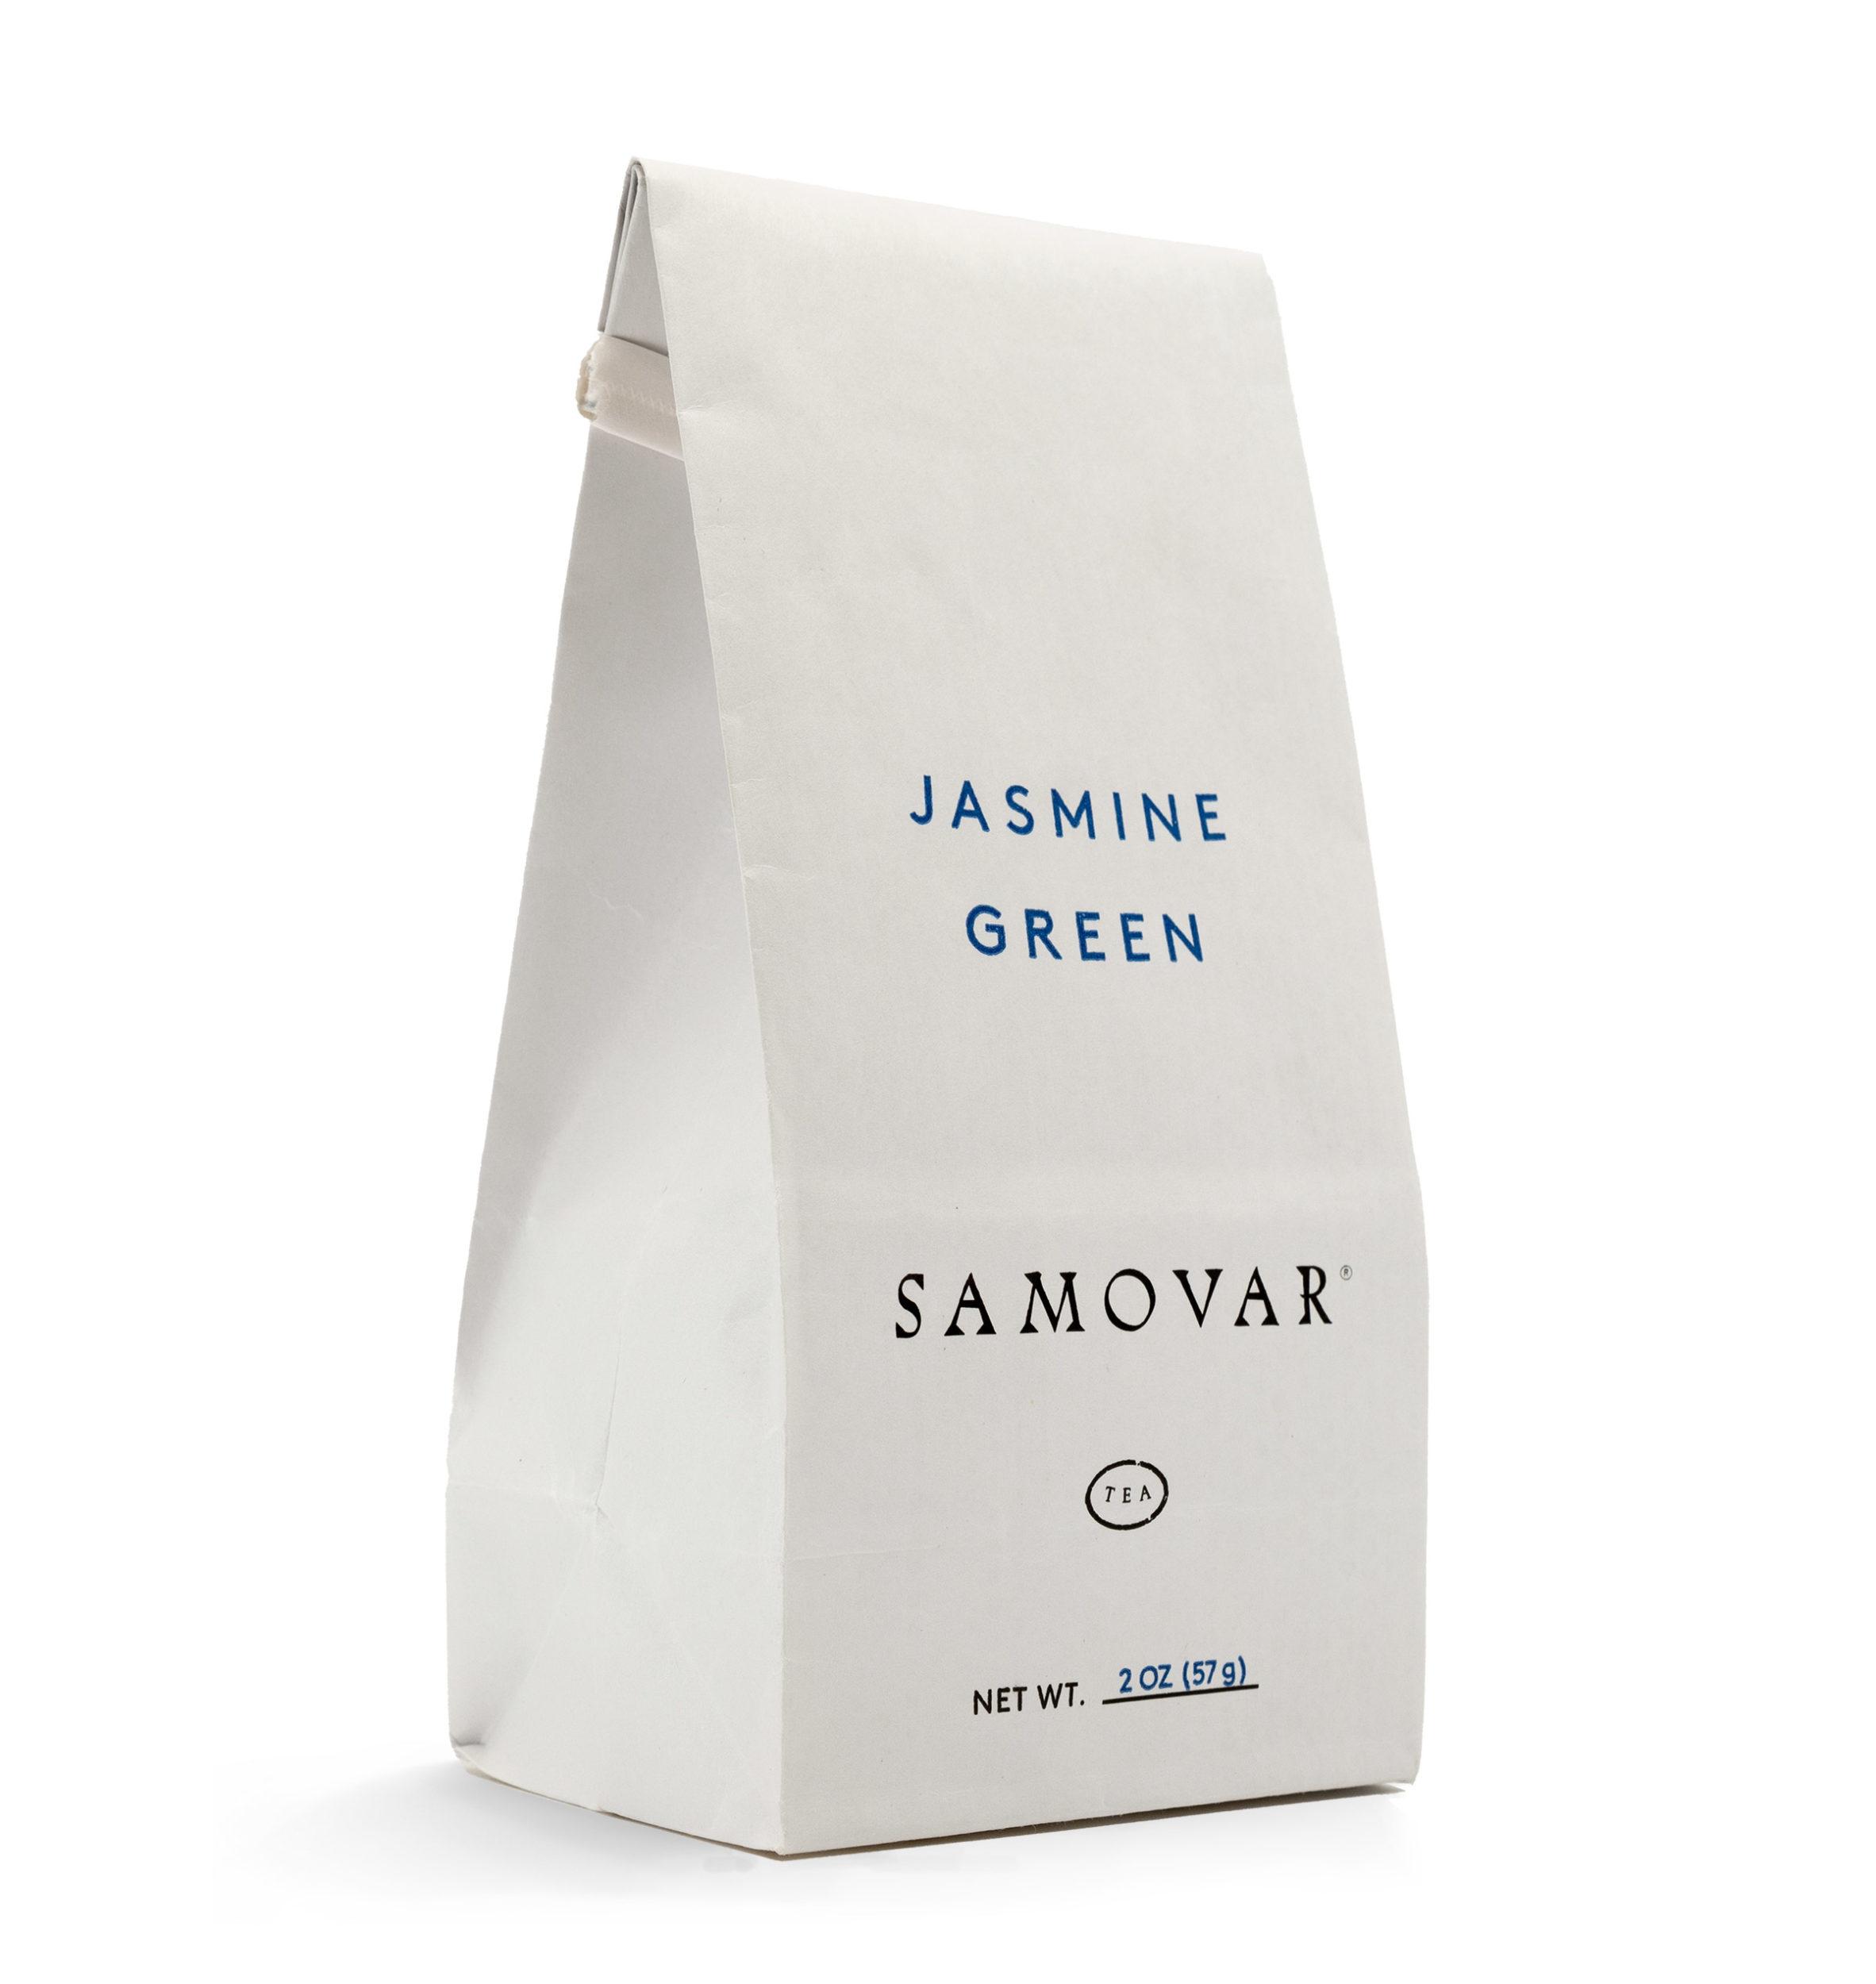 Jasmine - Front - 0202JAGRBG